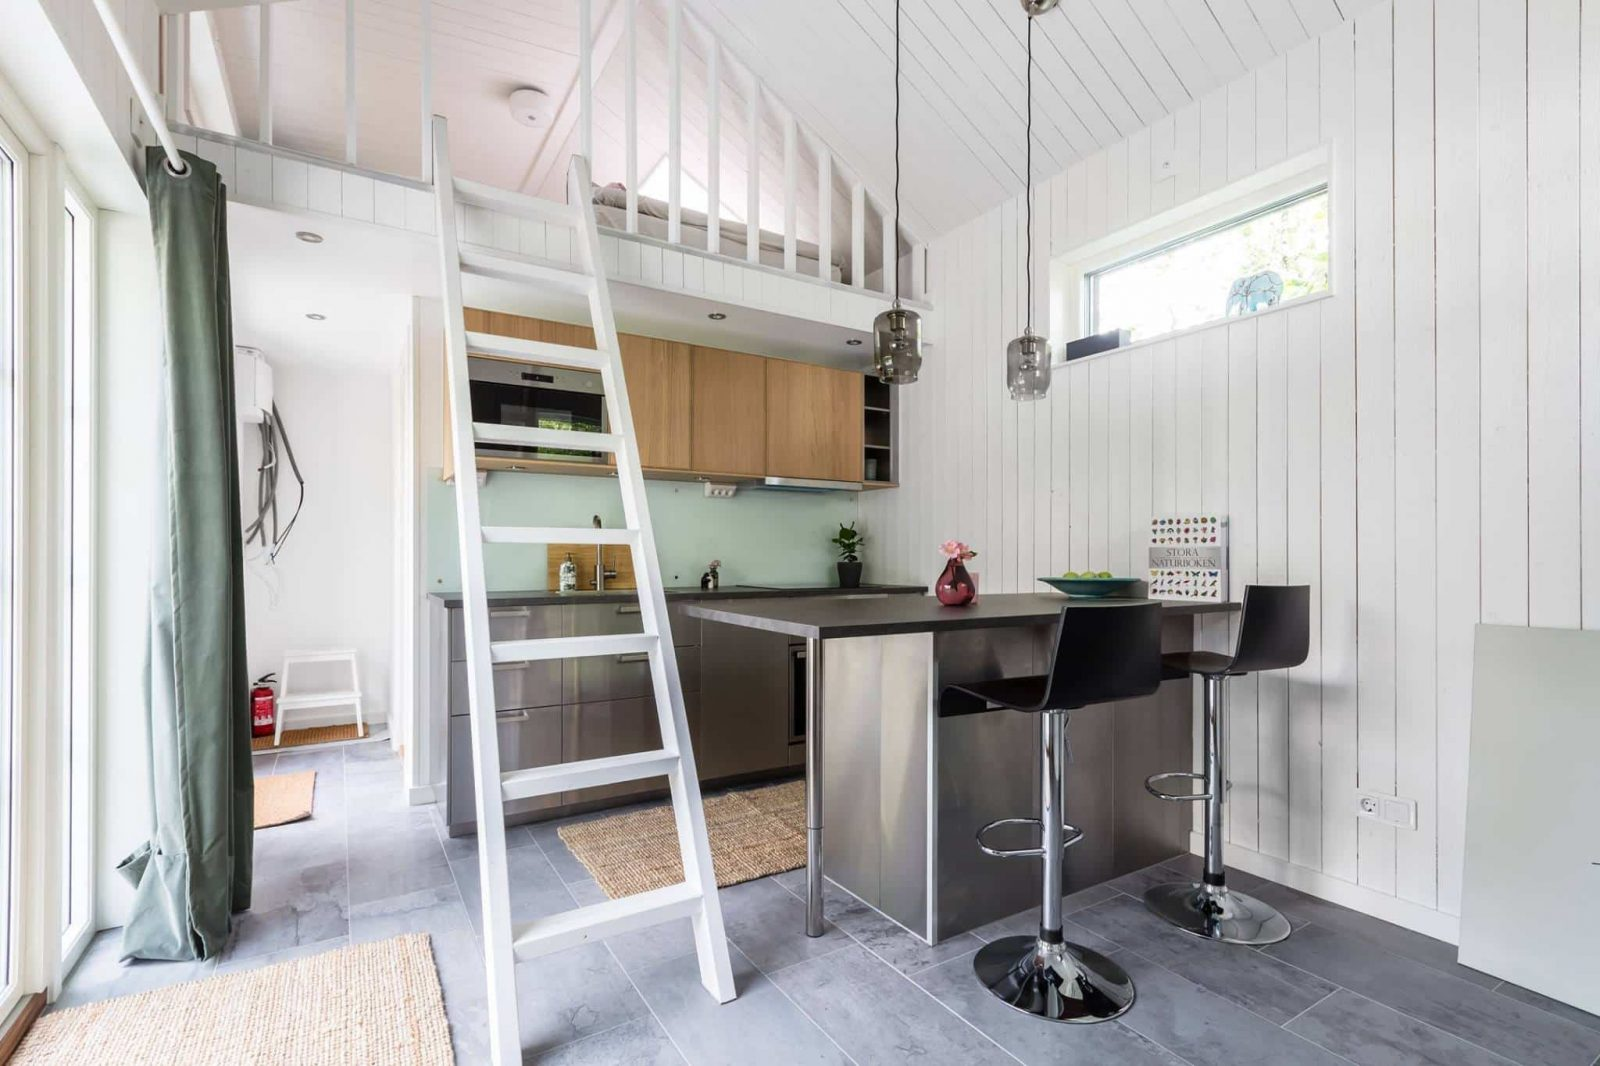 Renovera kök i Stockholm 6 - Renovera kök i Stockholm